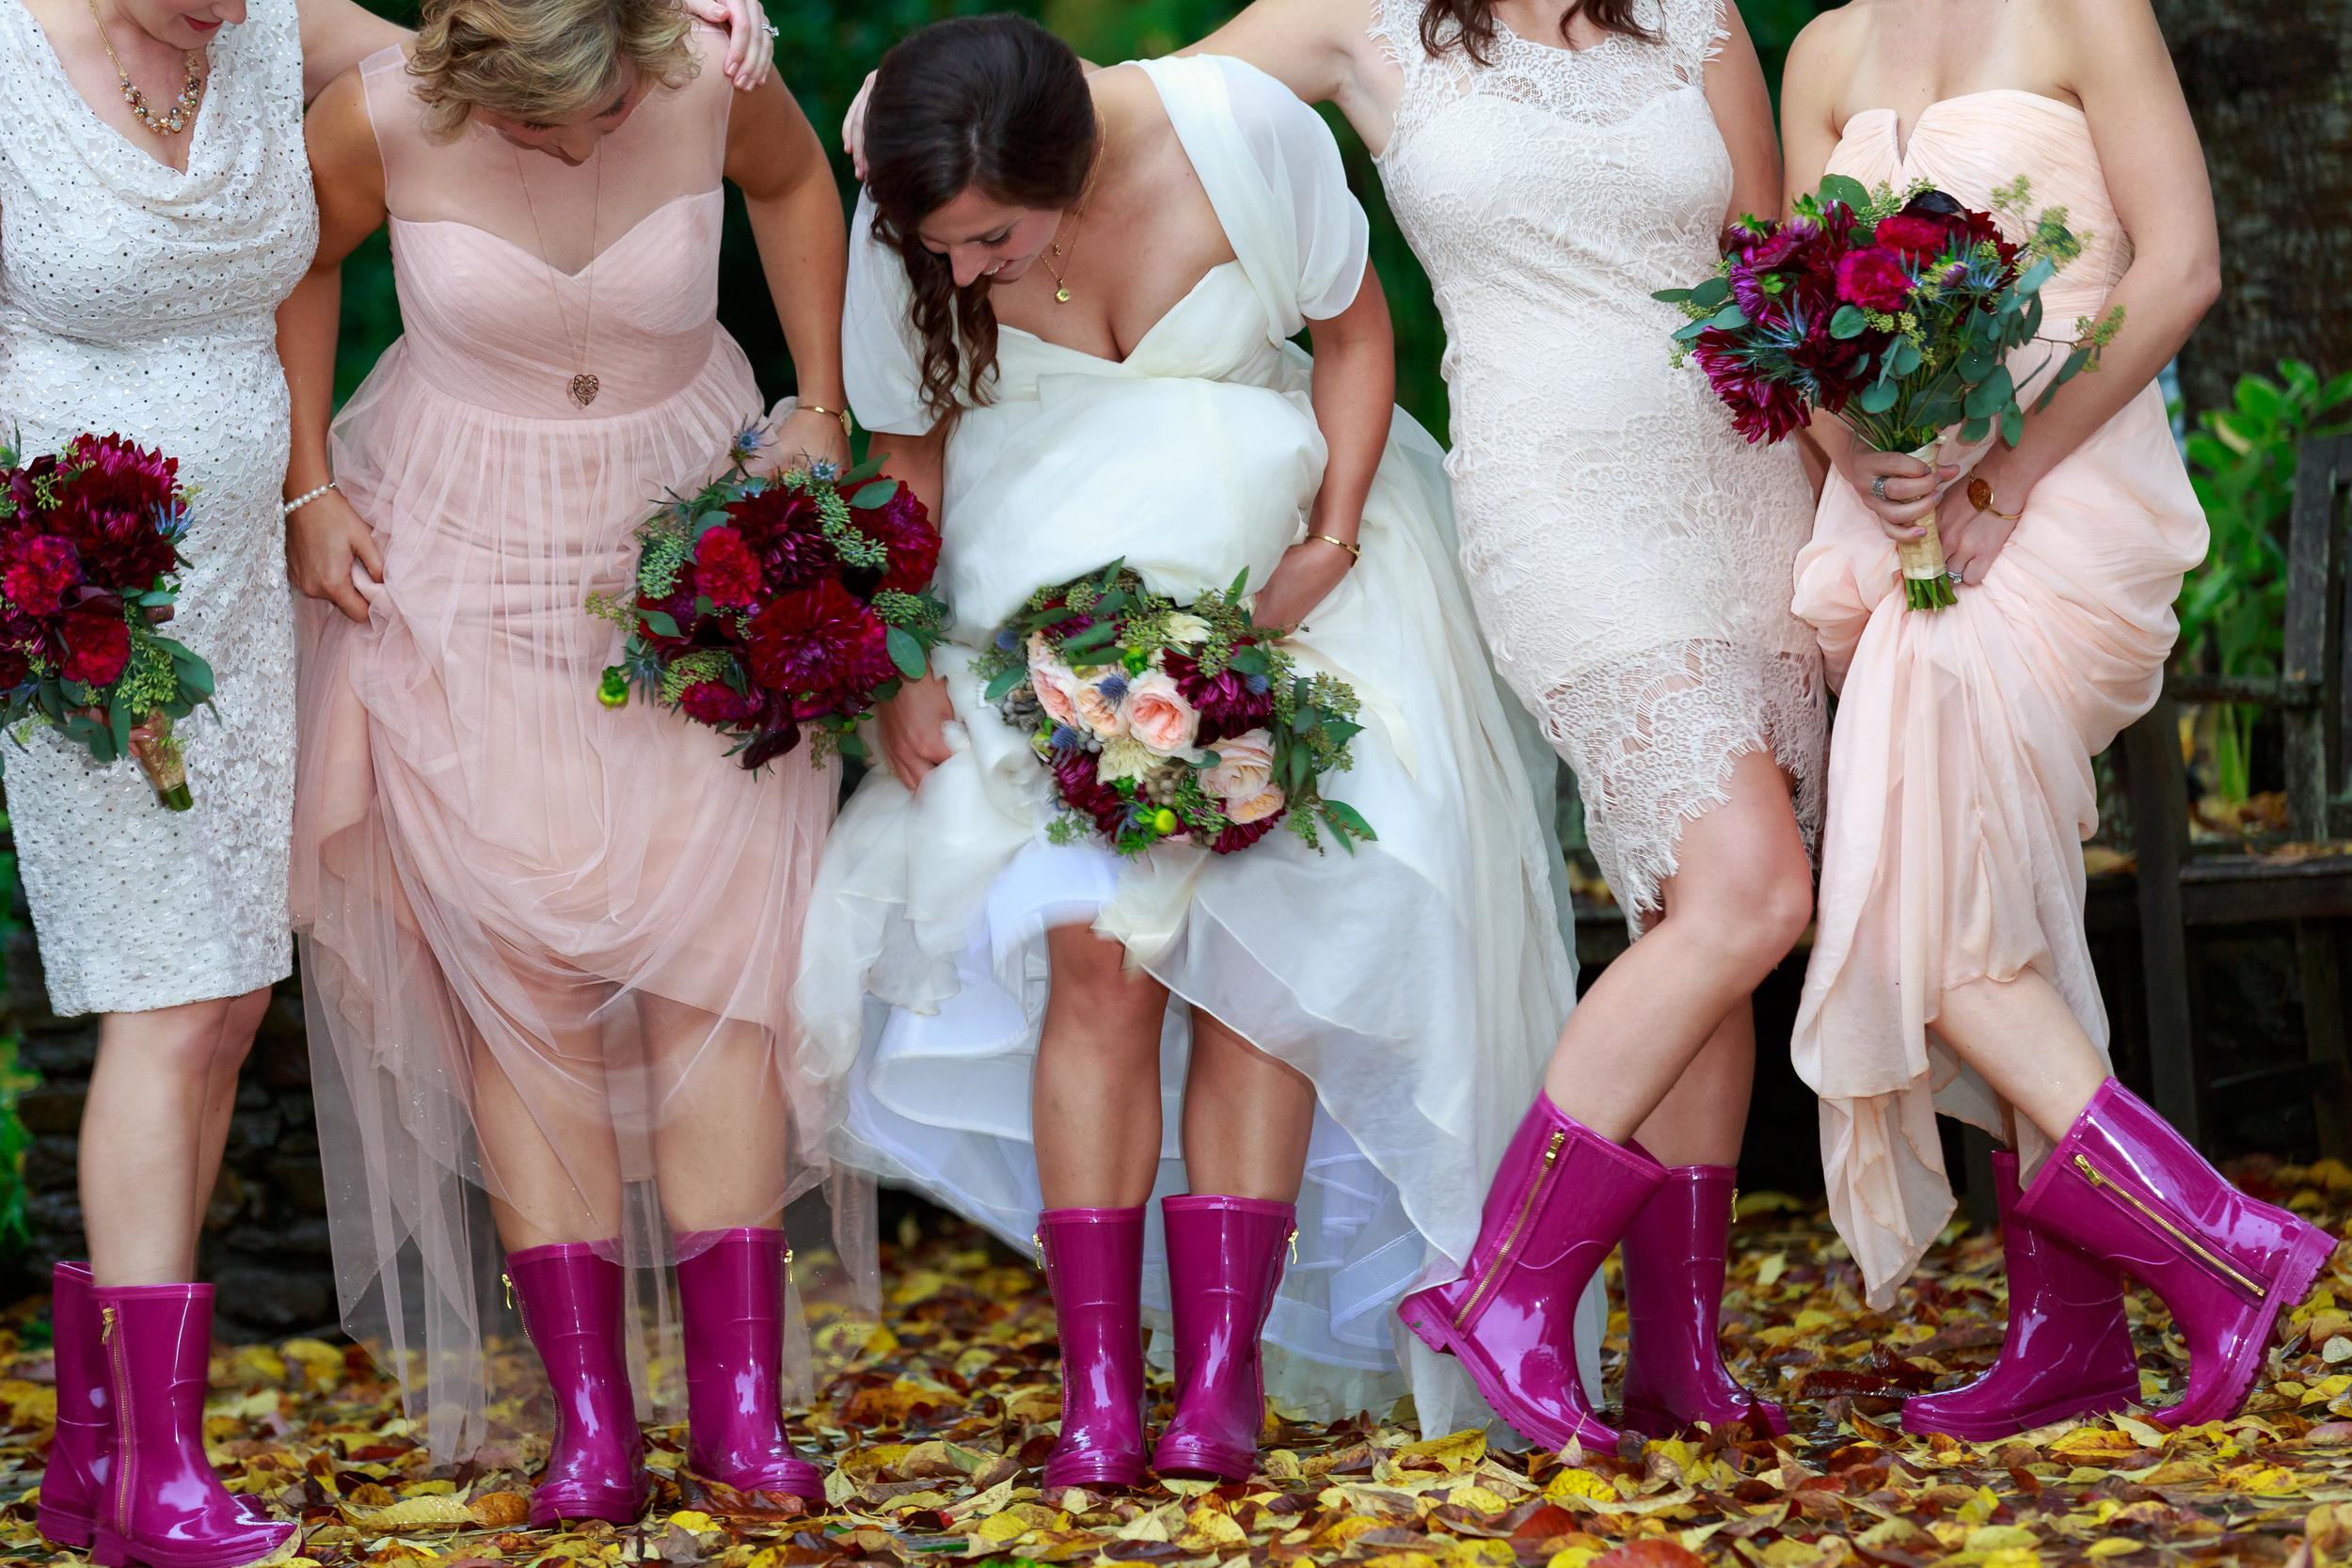 Christine Piascik & Alex McKenzie Wedding at North Carolina Arboretum-244.jpg